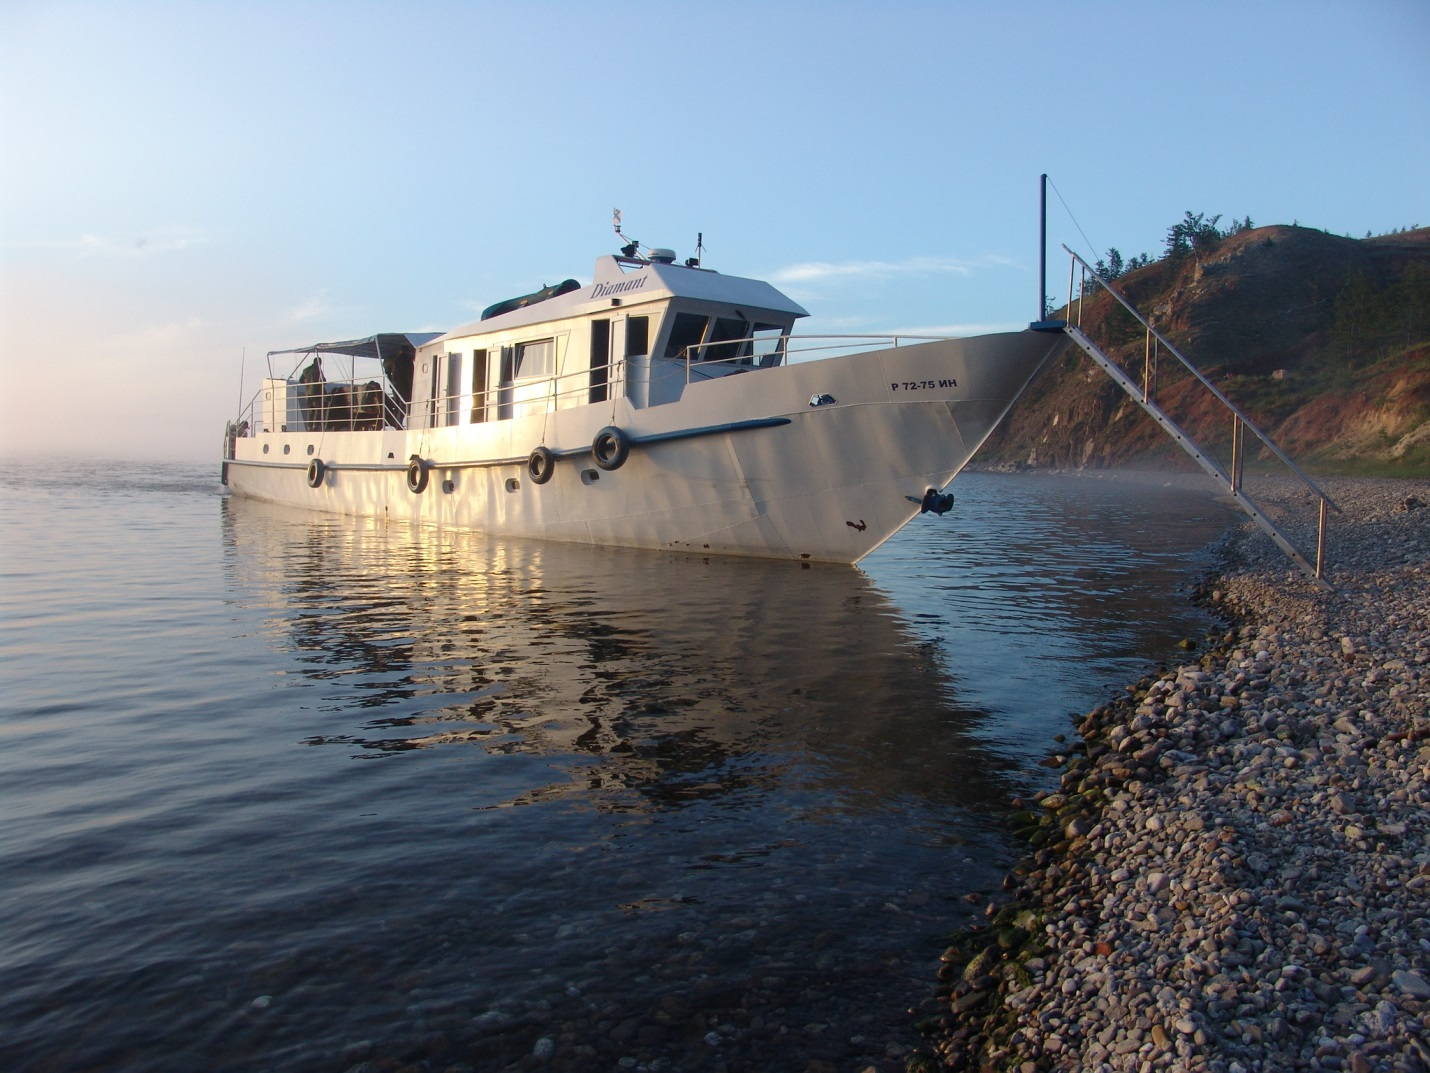 C:\Users\User\Desktop\All information Maksimov\Tourism\BAIKAL SAFARI\Fishing\Baikal fishing reports\2010\DSC02767.JPG